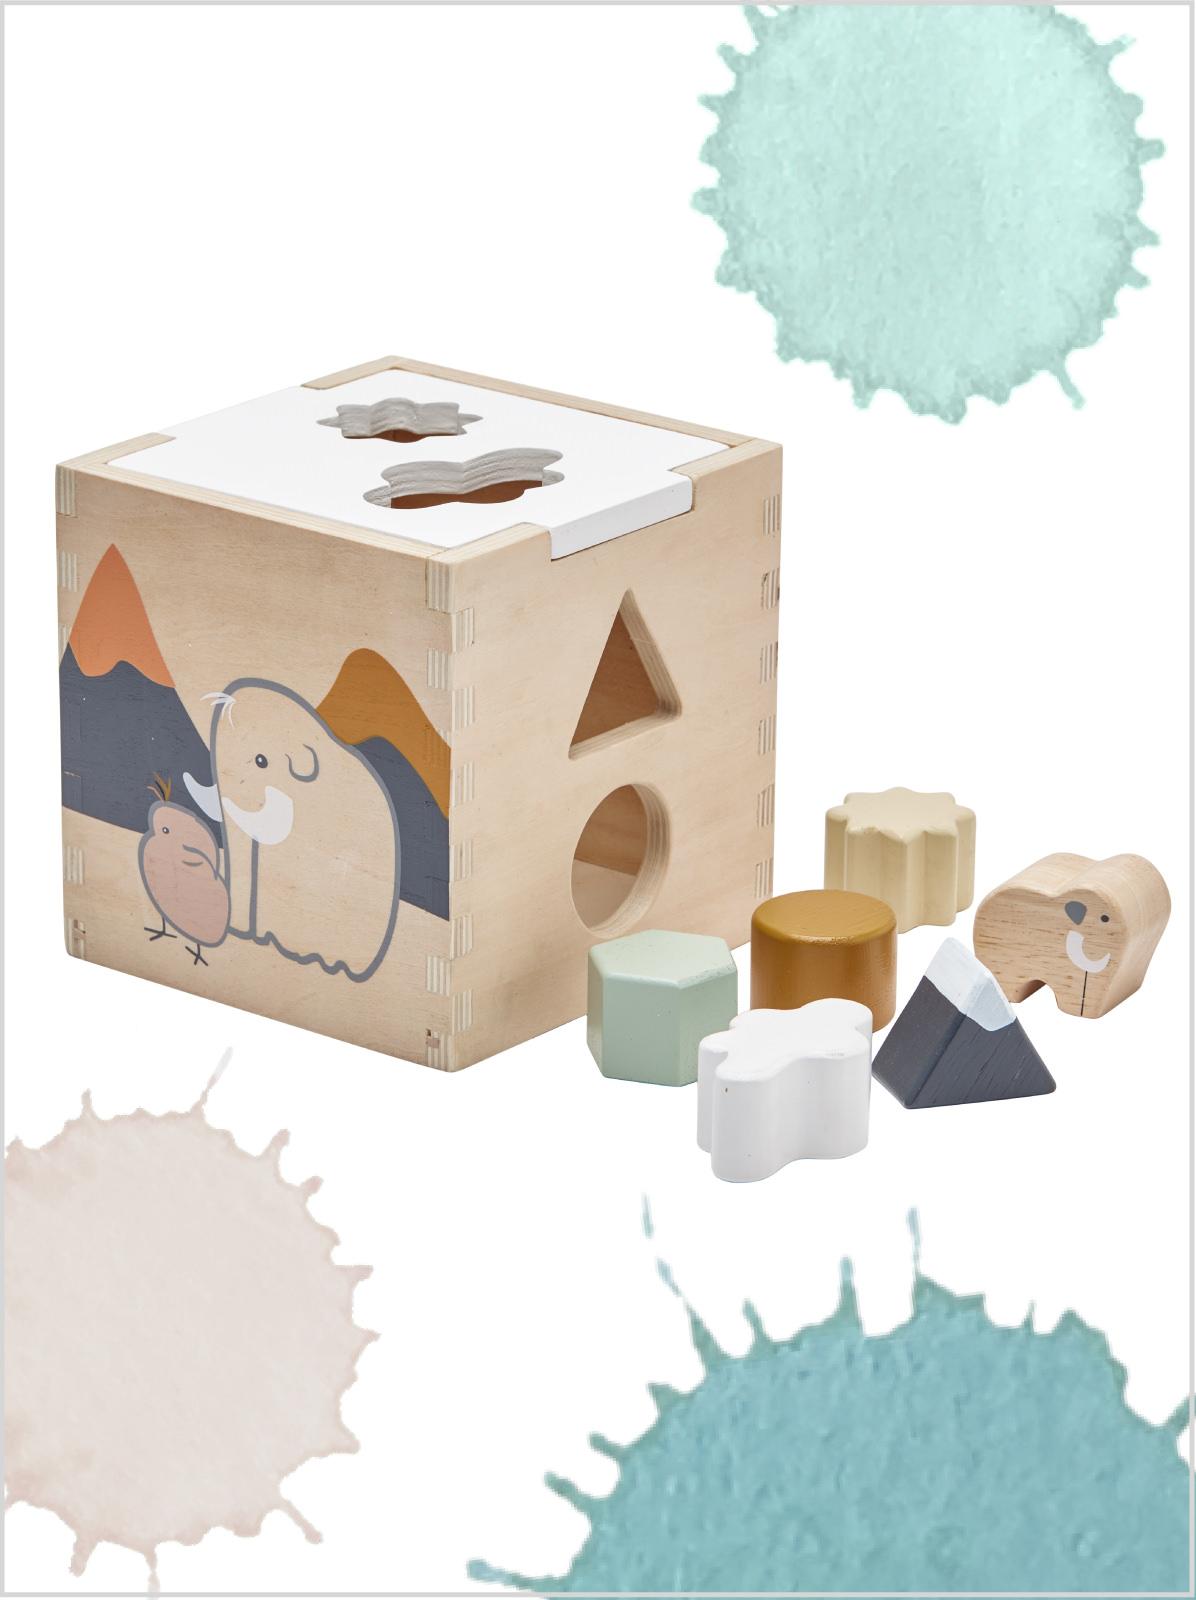 frederickandsophie-toys-kidsconcept-wooden-shape-sorter-mammoth